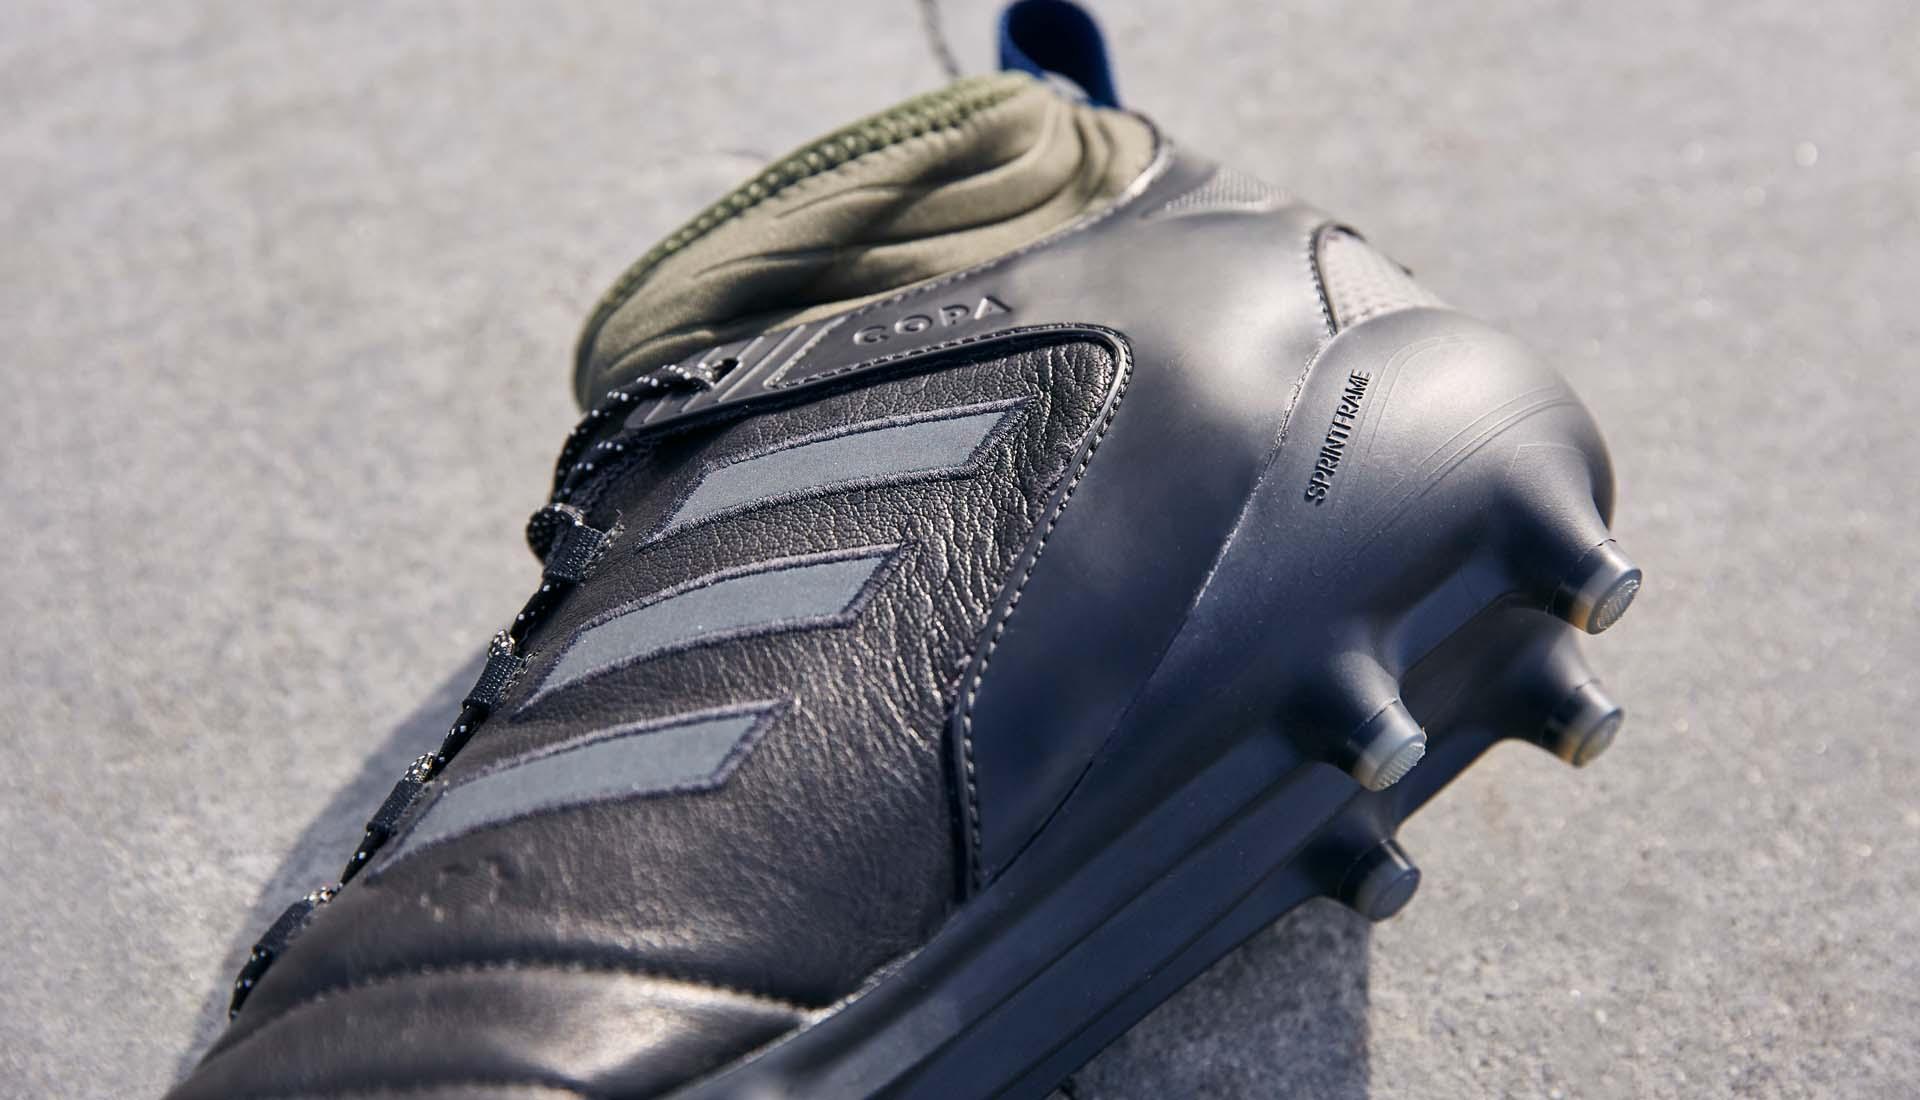 brand new 1b0ef 62560 10-adidas-copa-gore-tex-min.jpg